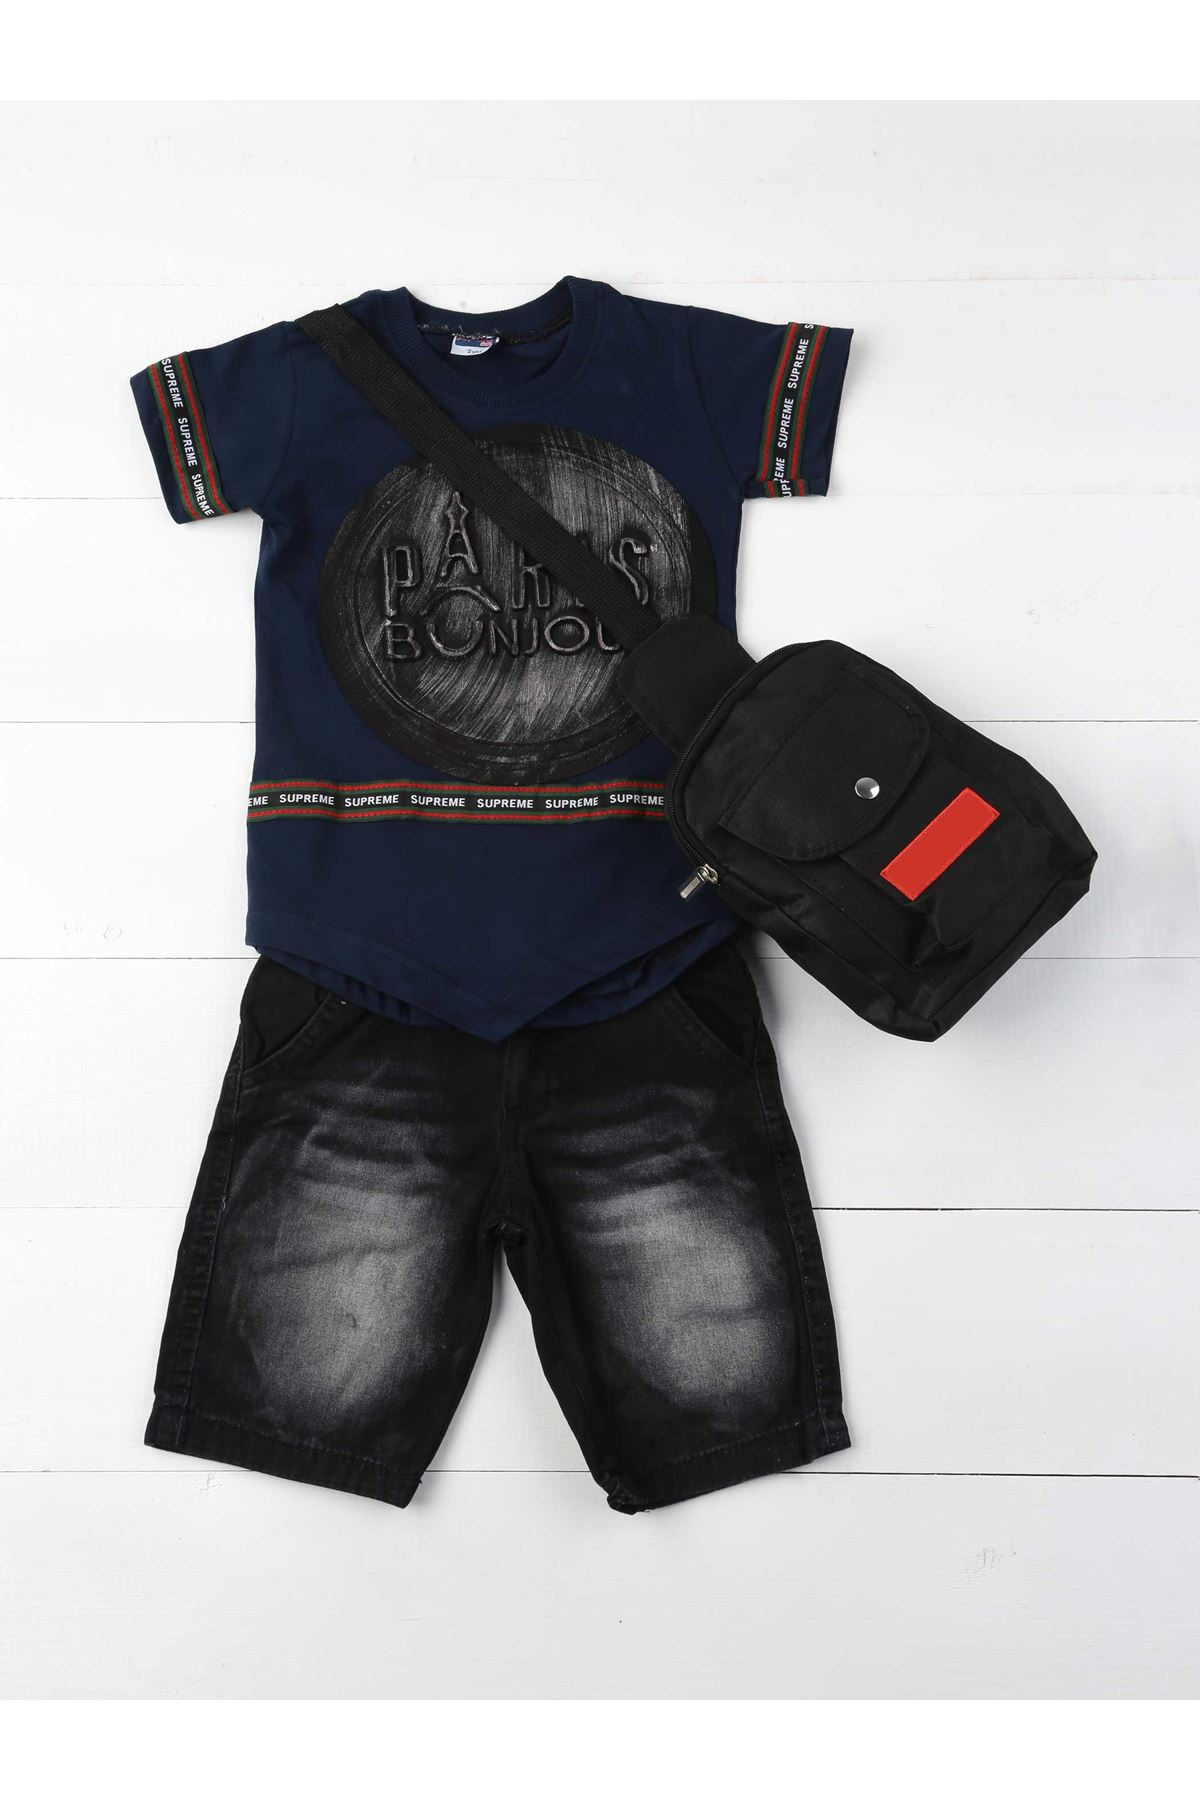 Navy blue Male Child 3 Pcs Set